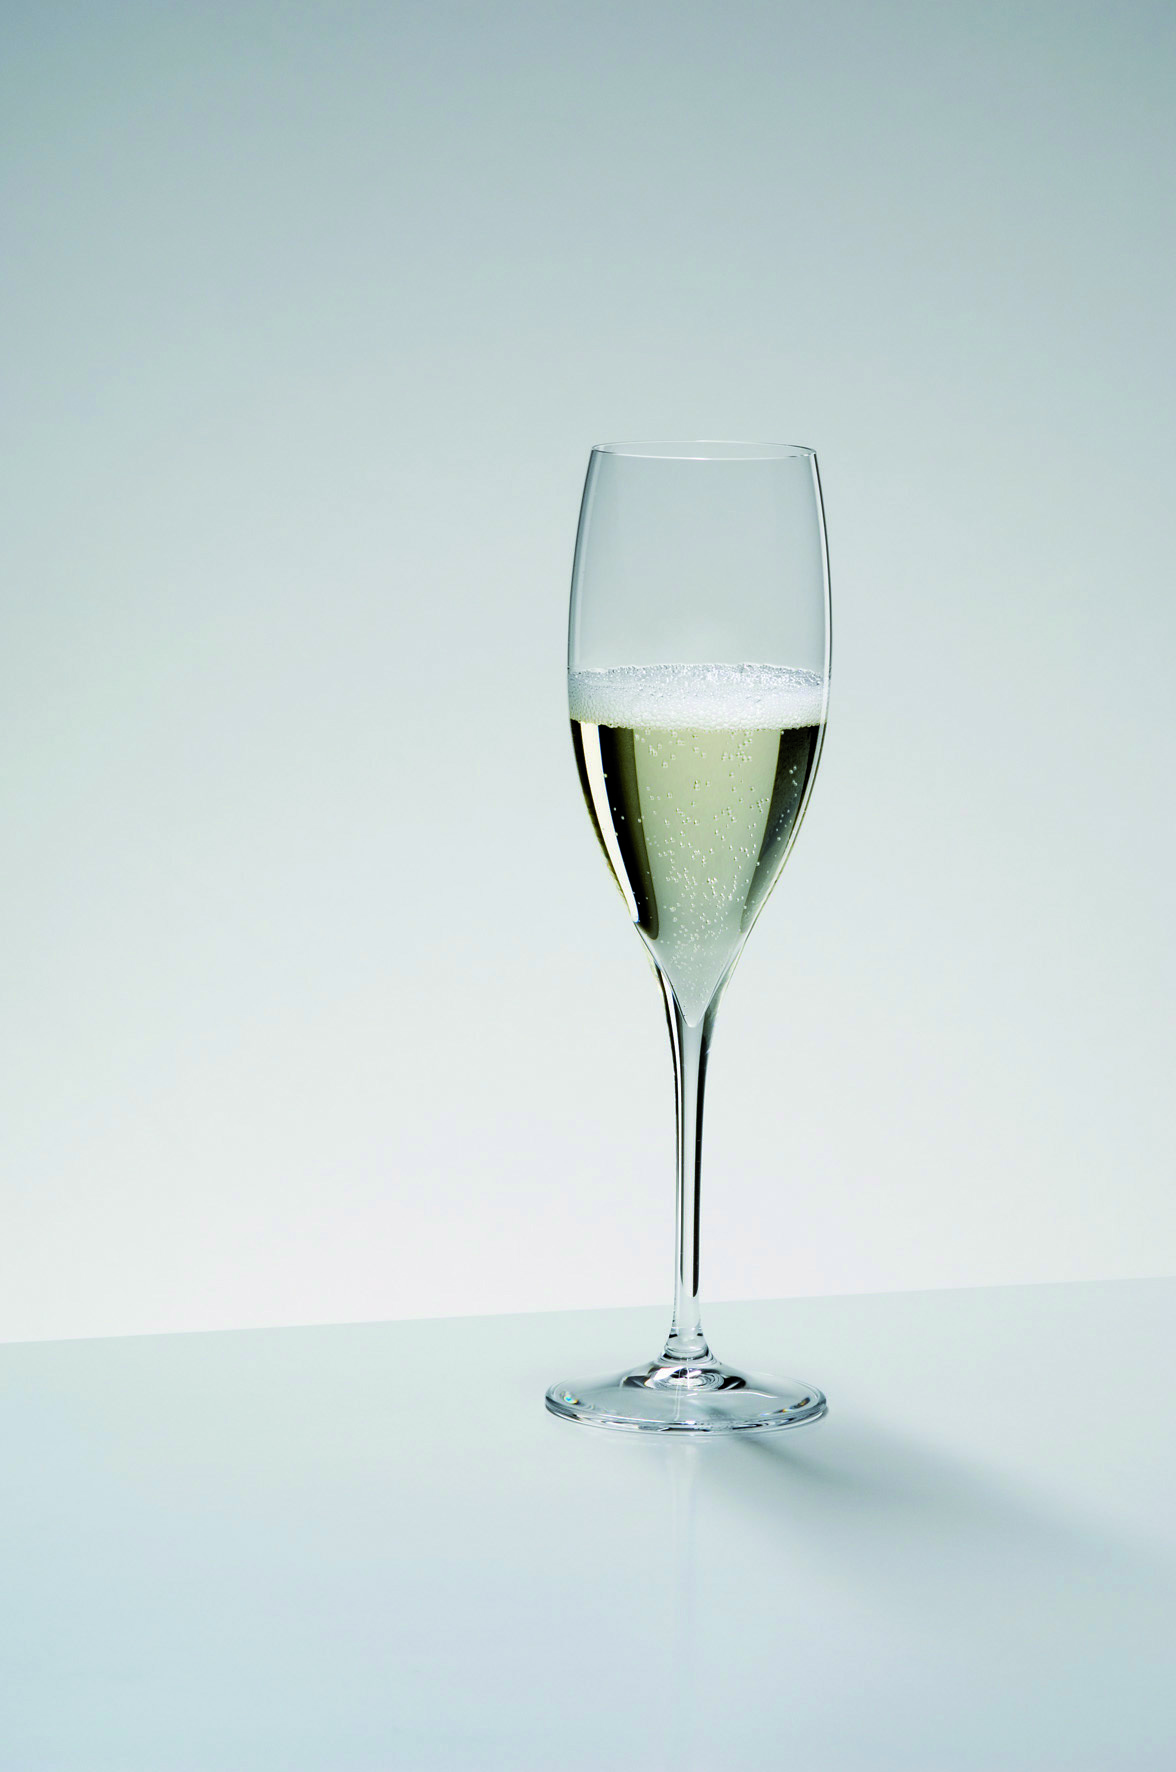 Бокалы Набор бокалов для шампанского 2 шт 250 мл Riedel Grape@Riedel Champagne Glass nabor-bokalov-dlya-shampanskogo-2-sht-250-ml-riedel-graperiedel-champagne-glass-avstriya.jpg